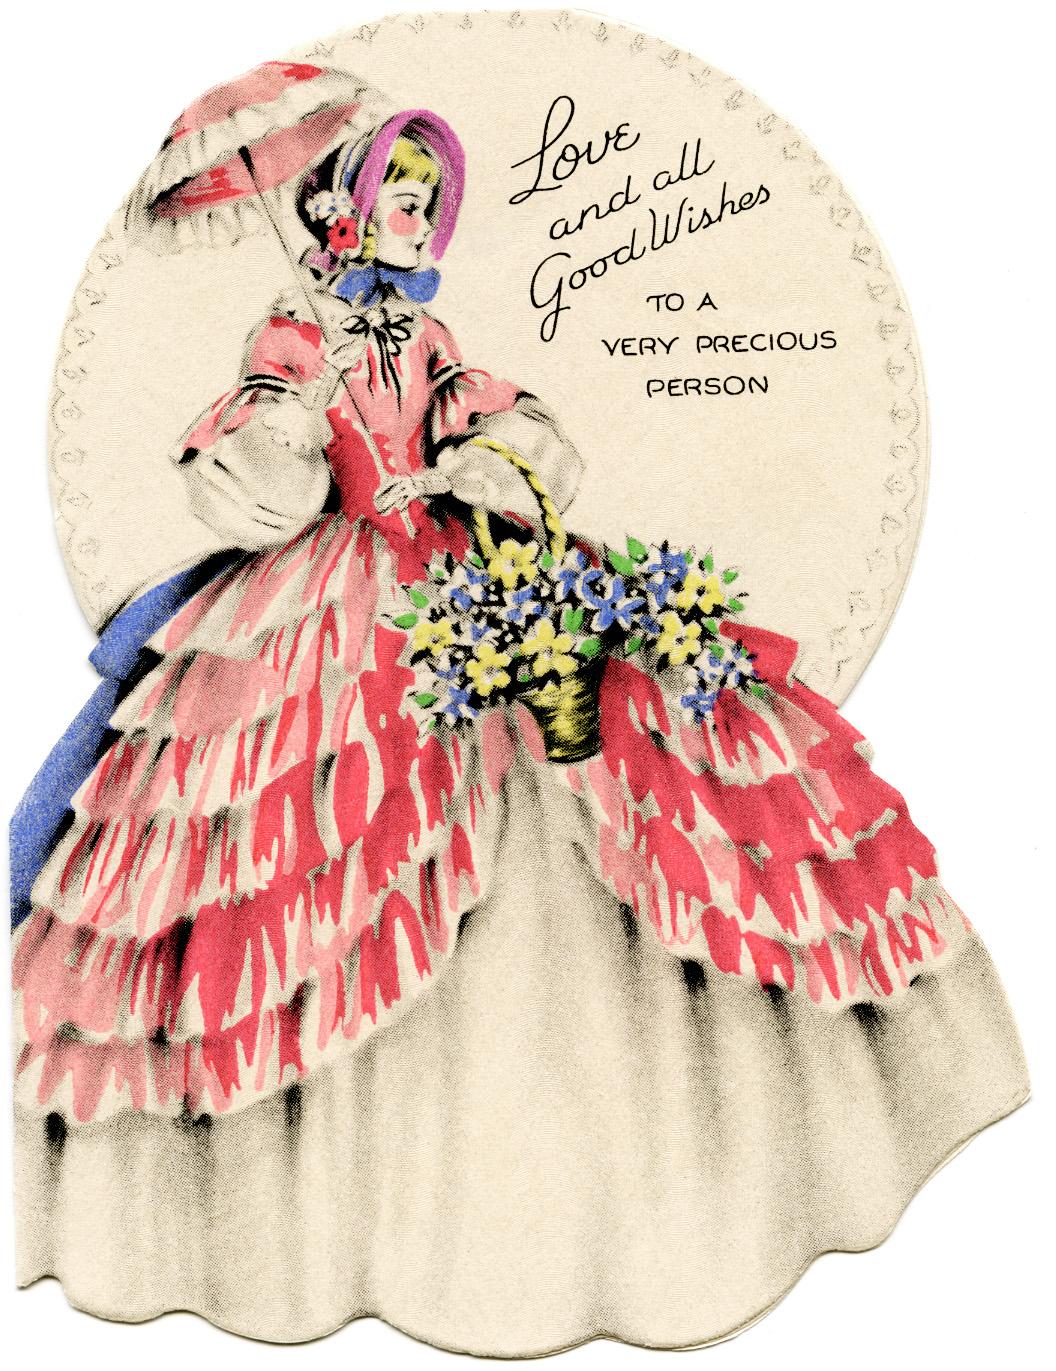 vintage birthday card retro birthday greeting card girl and kitten, Birthday card